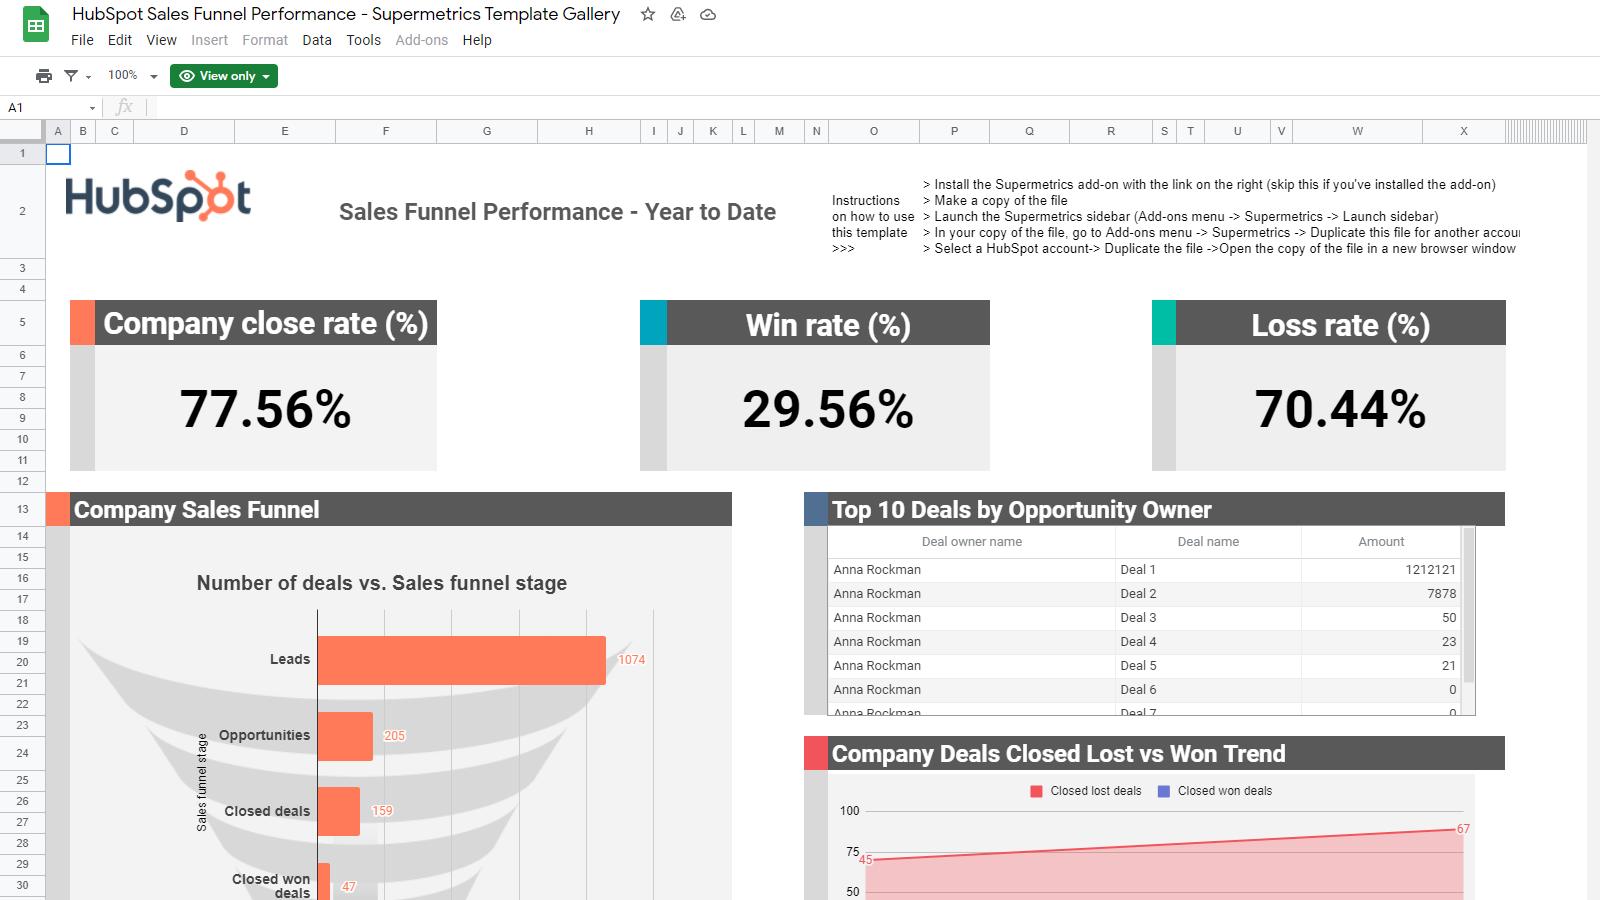 HubSpot Sales Funnel Performance